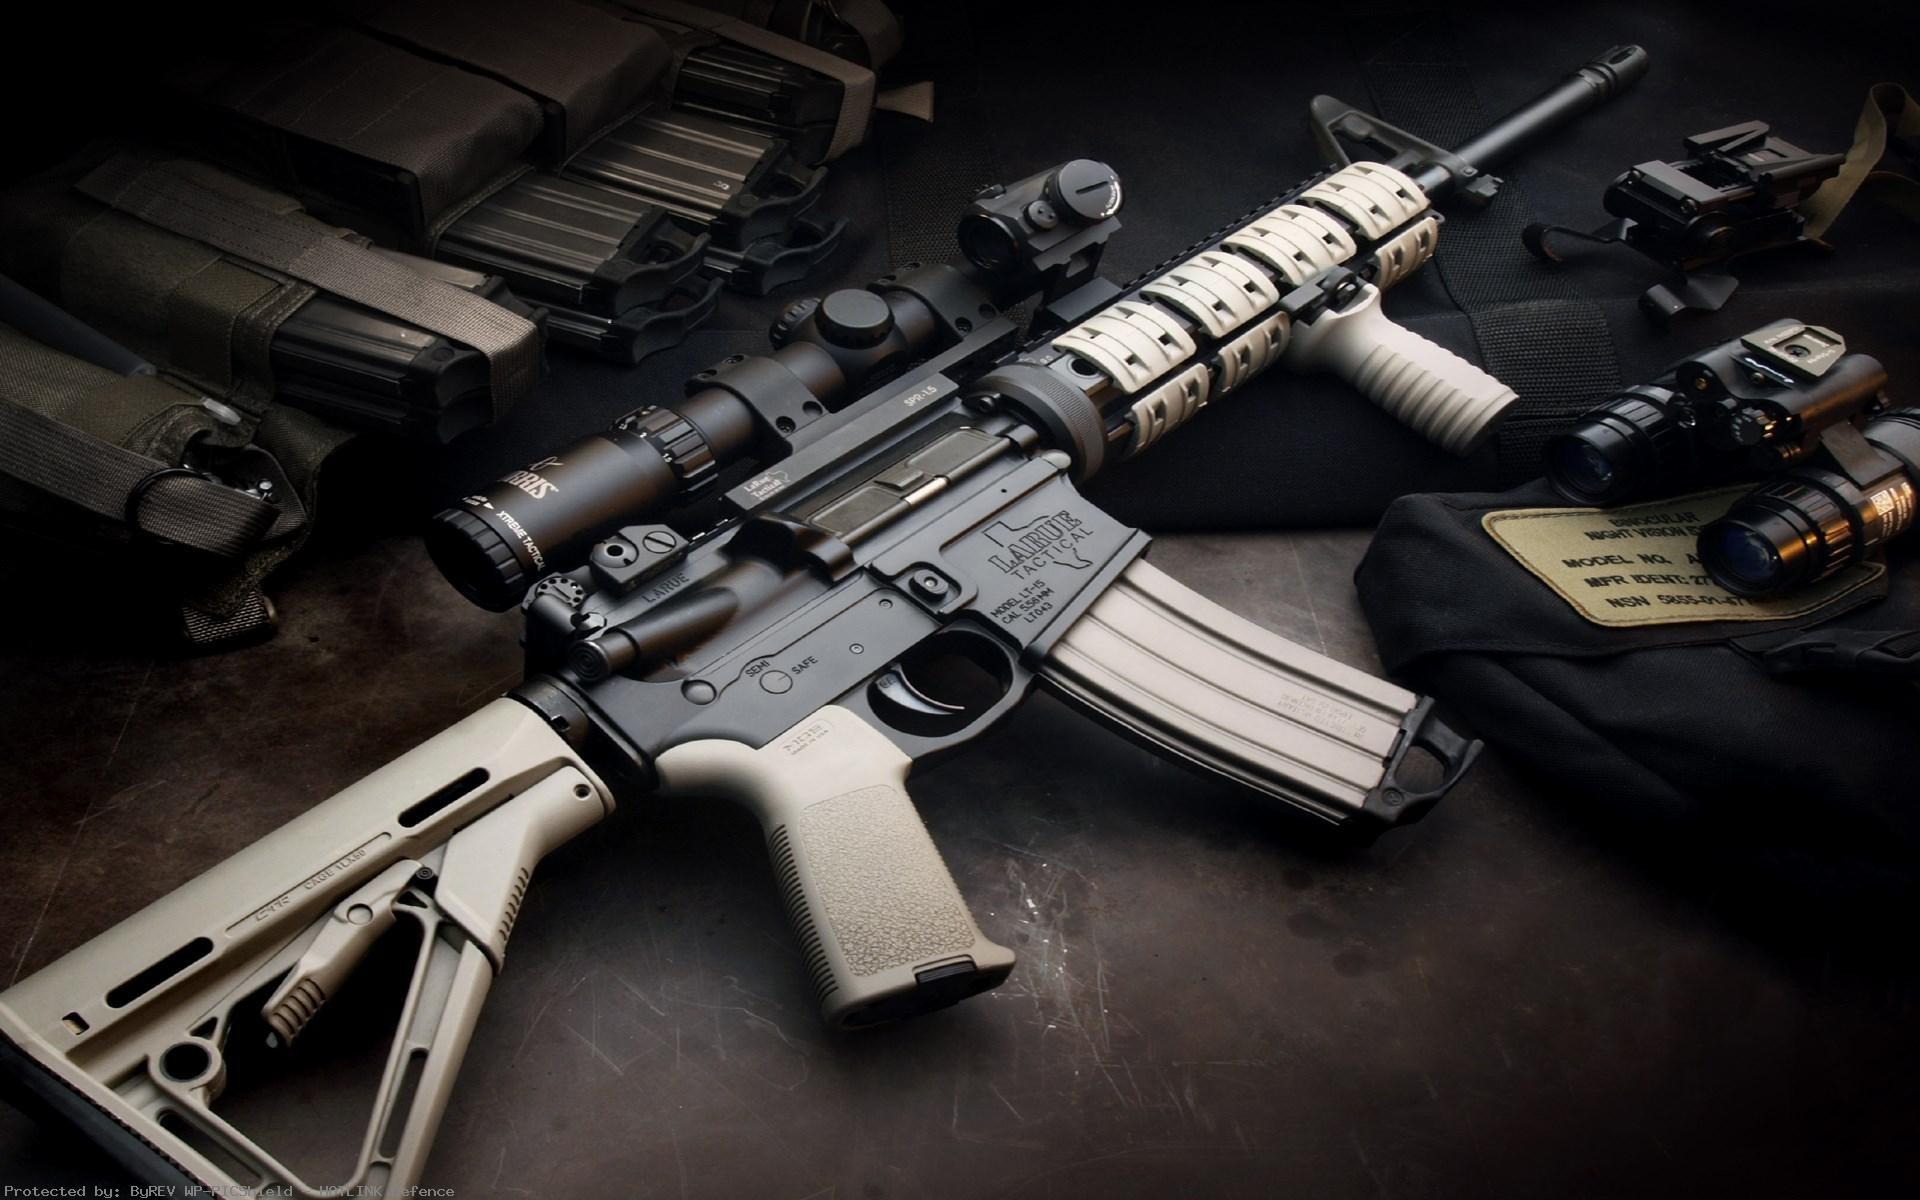 cool-guns-category-Free-desktop-cool-guns-image-